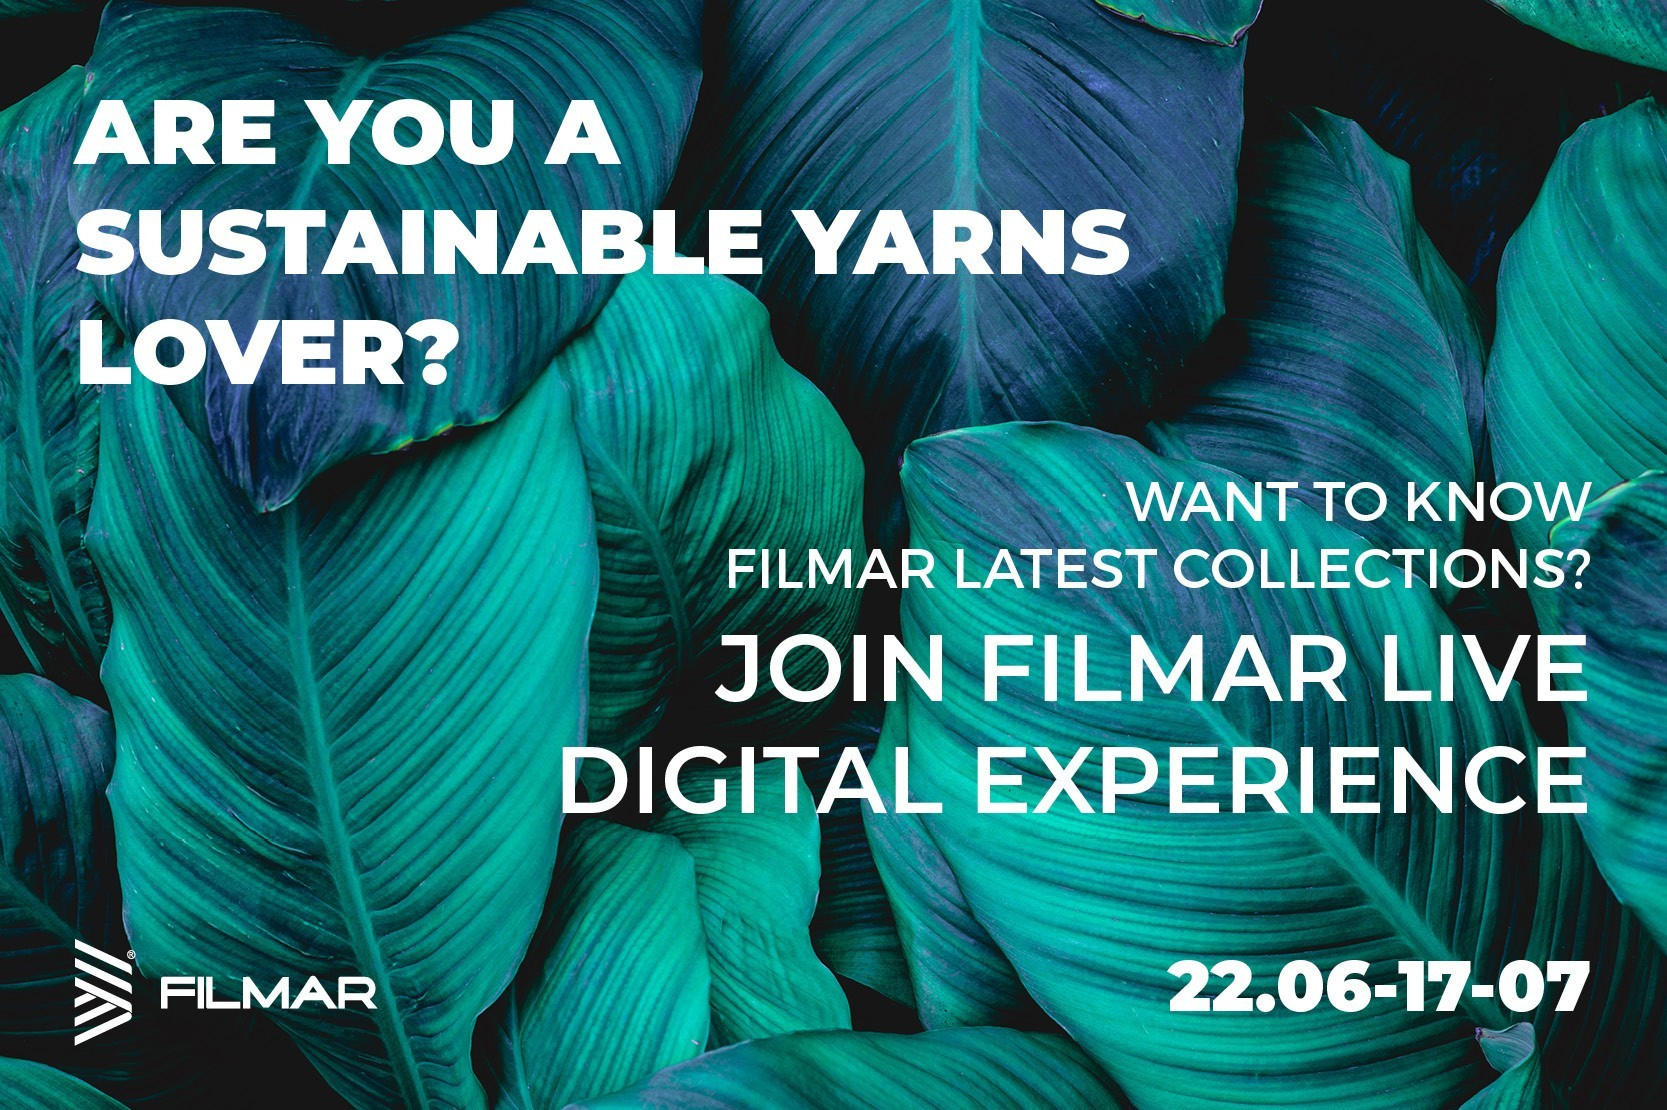 Filmar Focuses On Digital With The Live Digital Experience